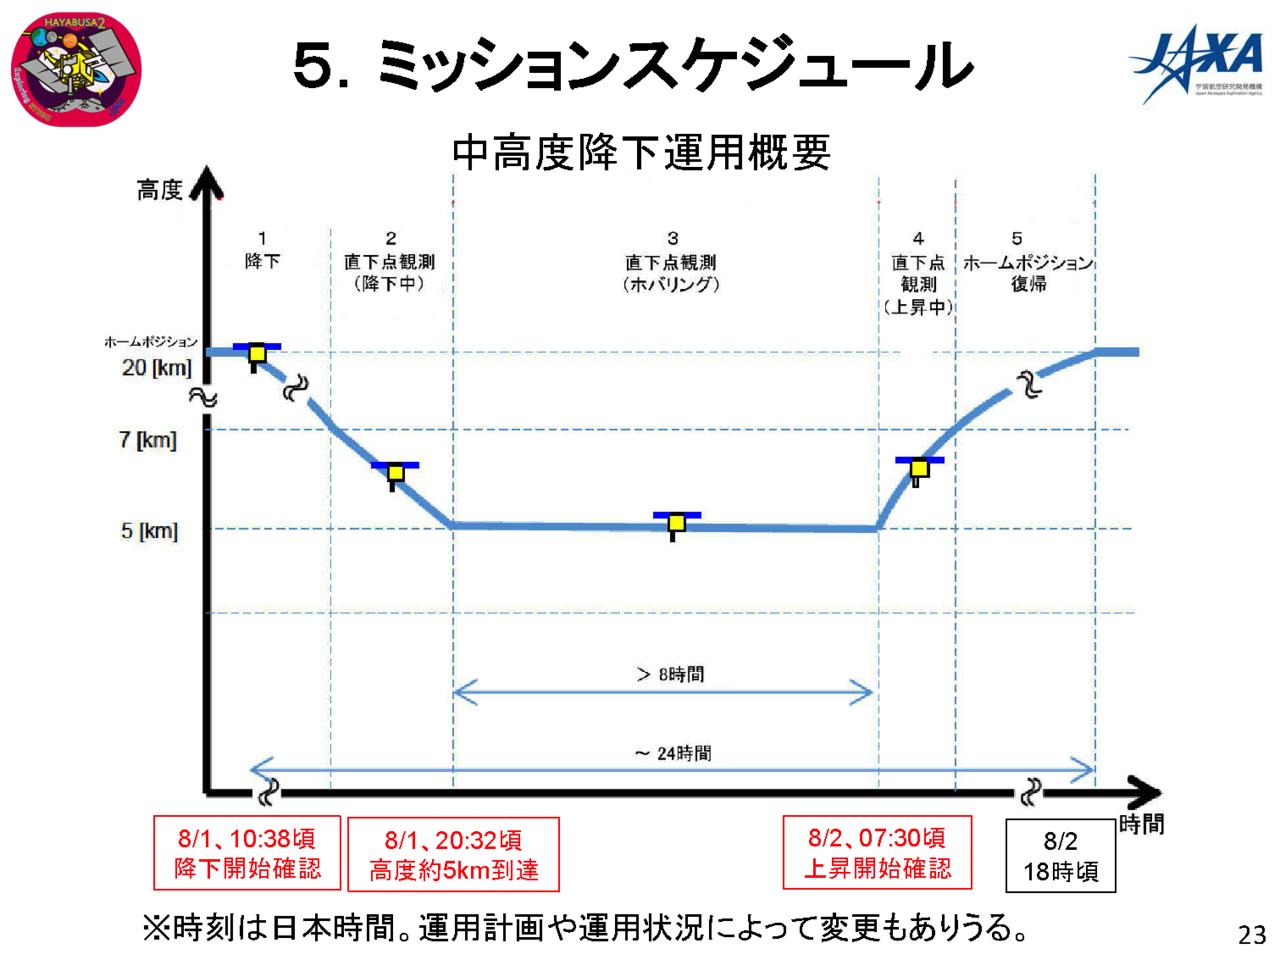 f:id:Imamura:20180802145943p:plain